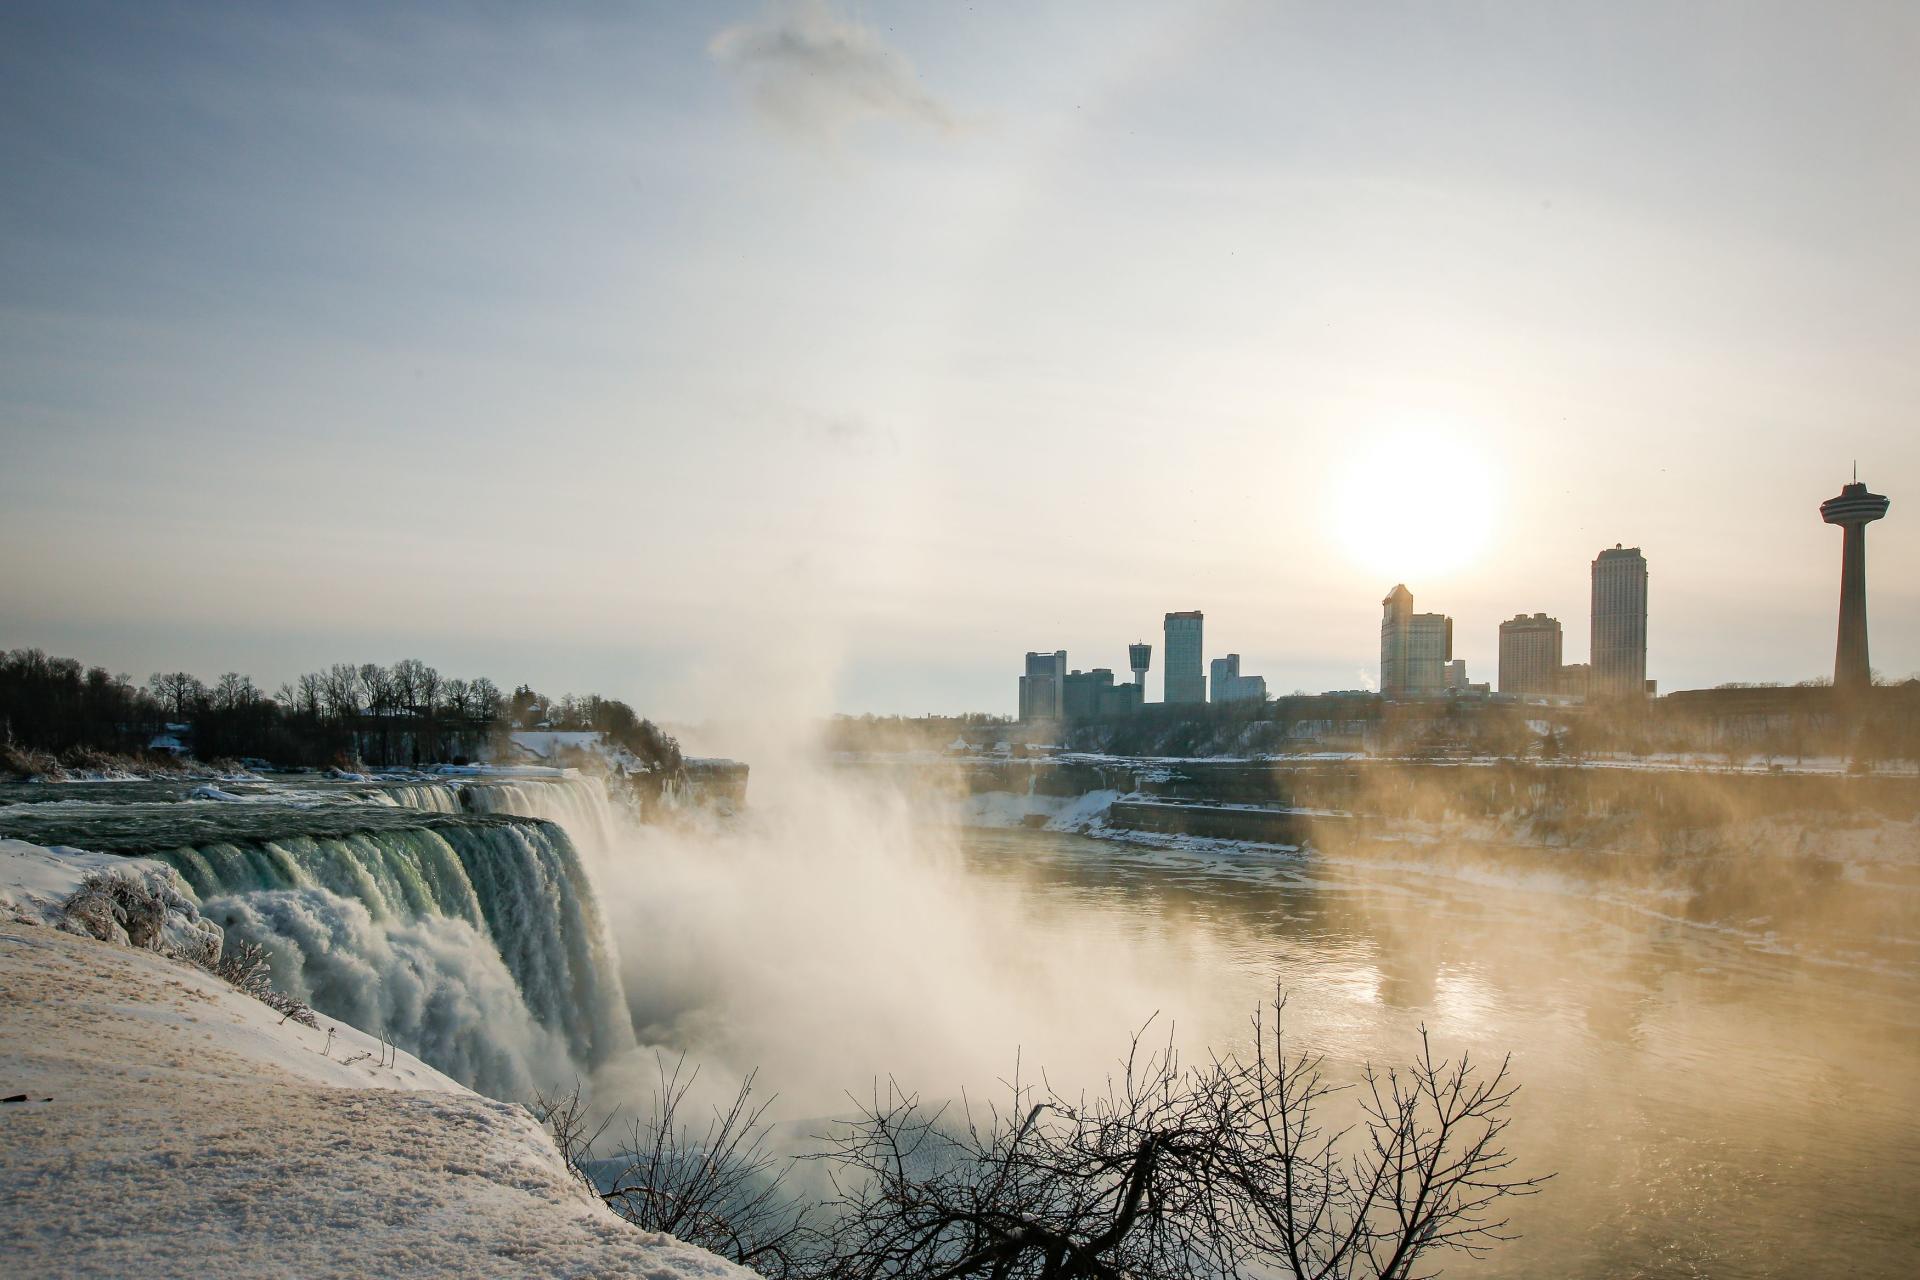 American Falls and the city of Niagara Falls, USA on February 21, 2021.